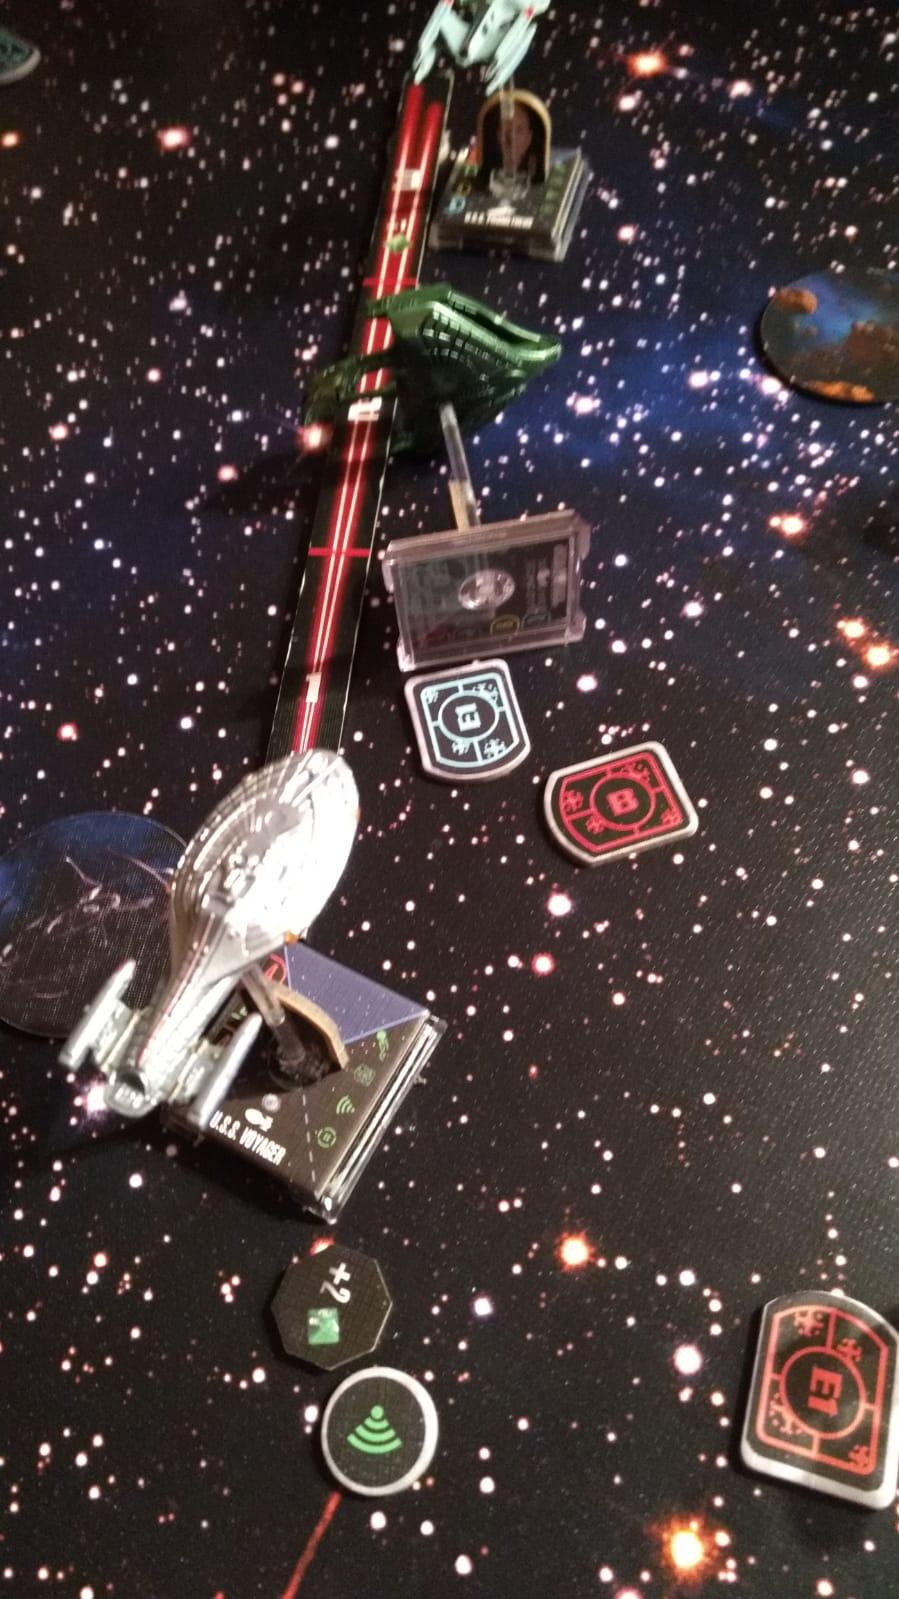 Kampf um Jouret [Föd. vs. Romulaner] Spiel810